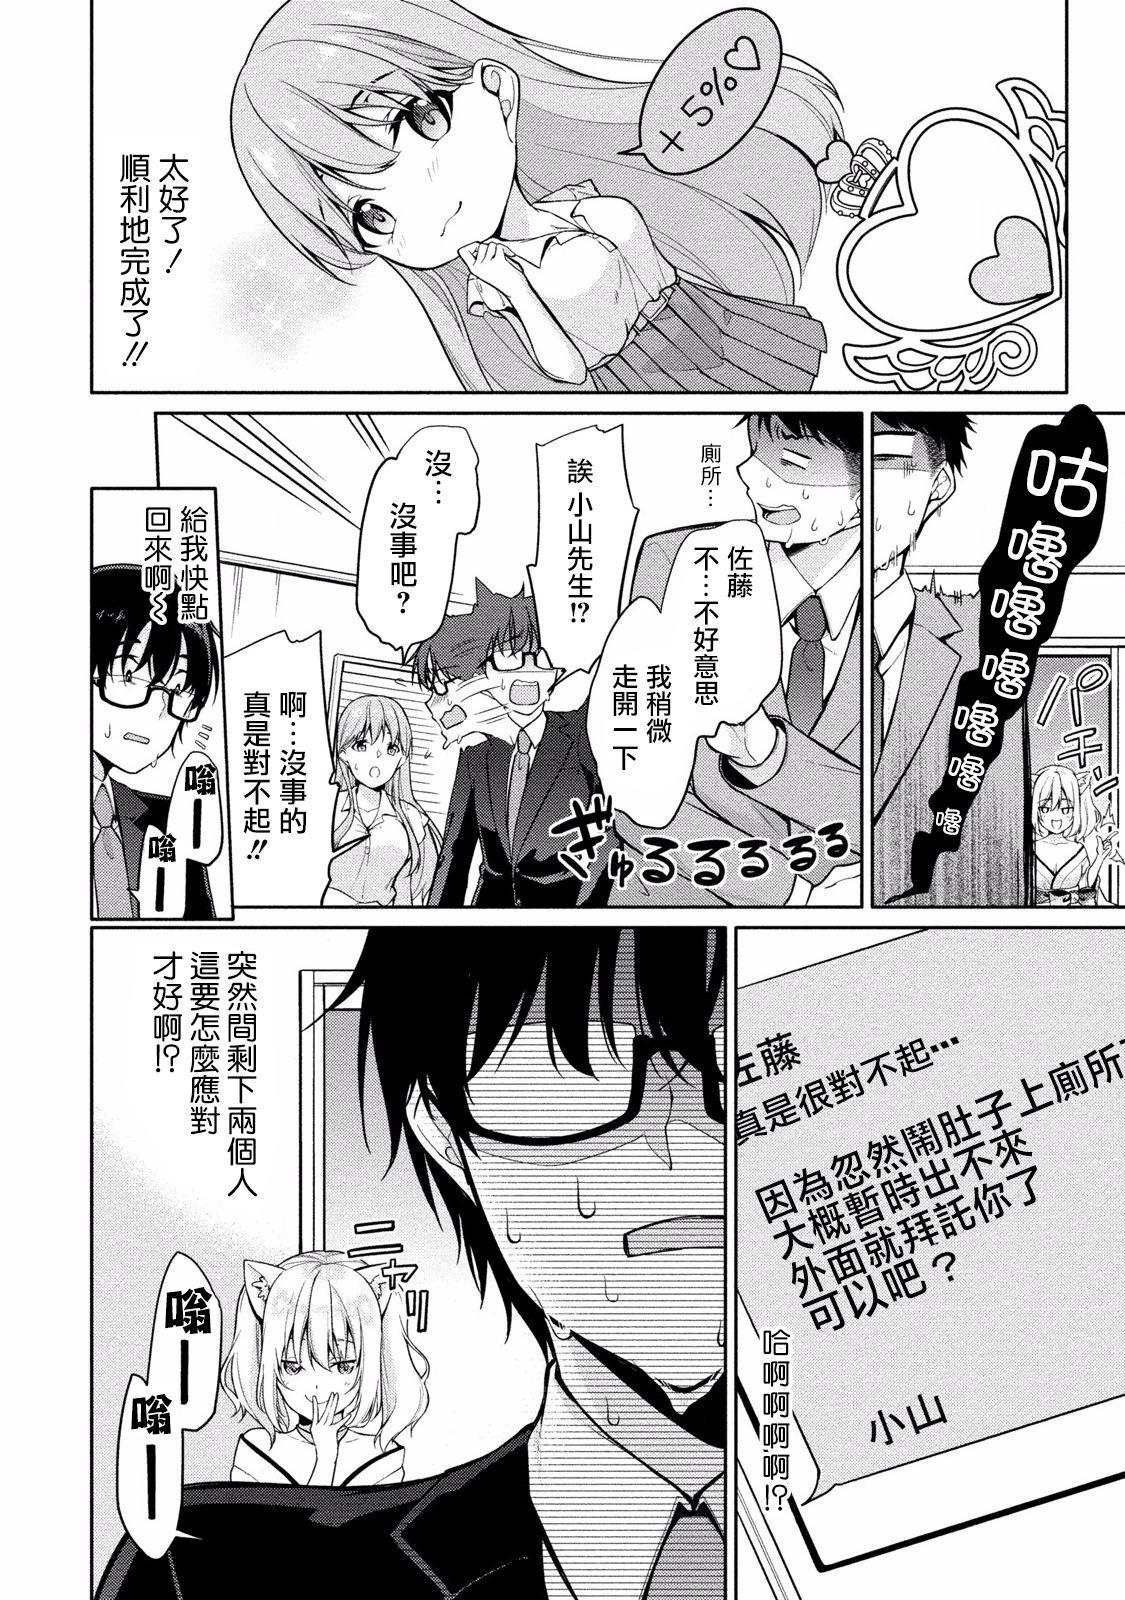 [Yukino] Satou-kun wa Miteiru. ~Kami-sama Appli de Onnanoko no Kokoro o Nozoitara Do XX datta~ Ch. 2 | 佐藤君正在偷窥。~用神大人的APP偷窥女孩子的内心却发现原来是抖XX~02话 [Chinese] [前线作♂战♀基地] 9